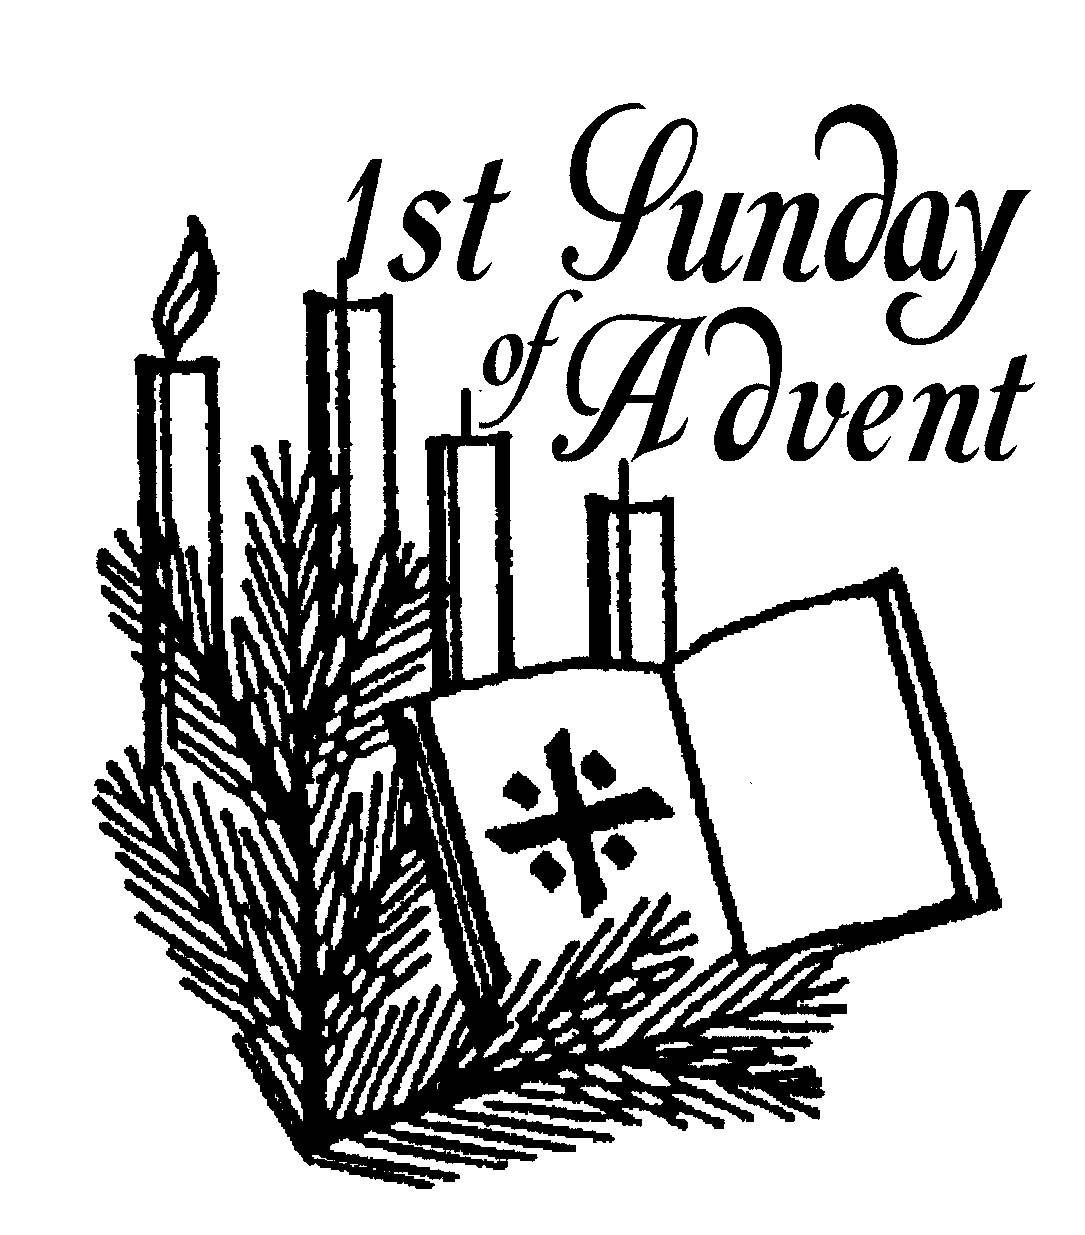 Free Advent Clipart, Download Free Clip Art, Free Clip Art.